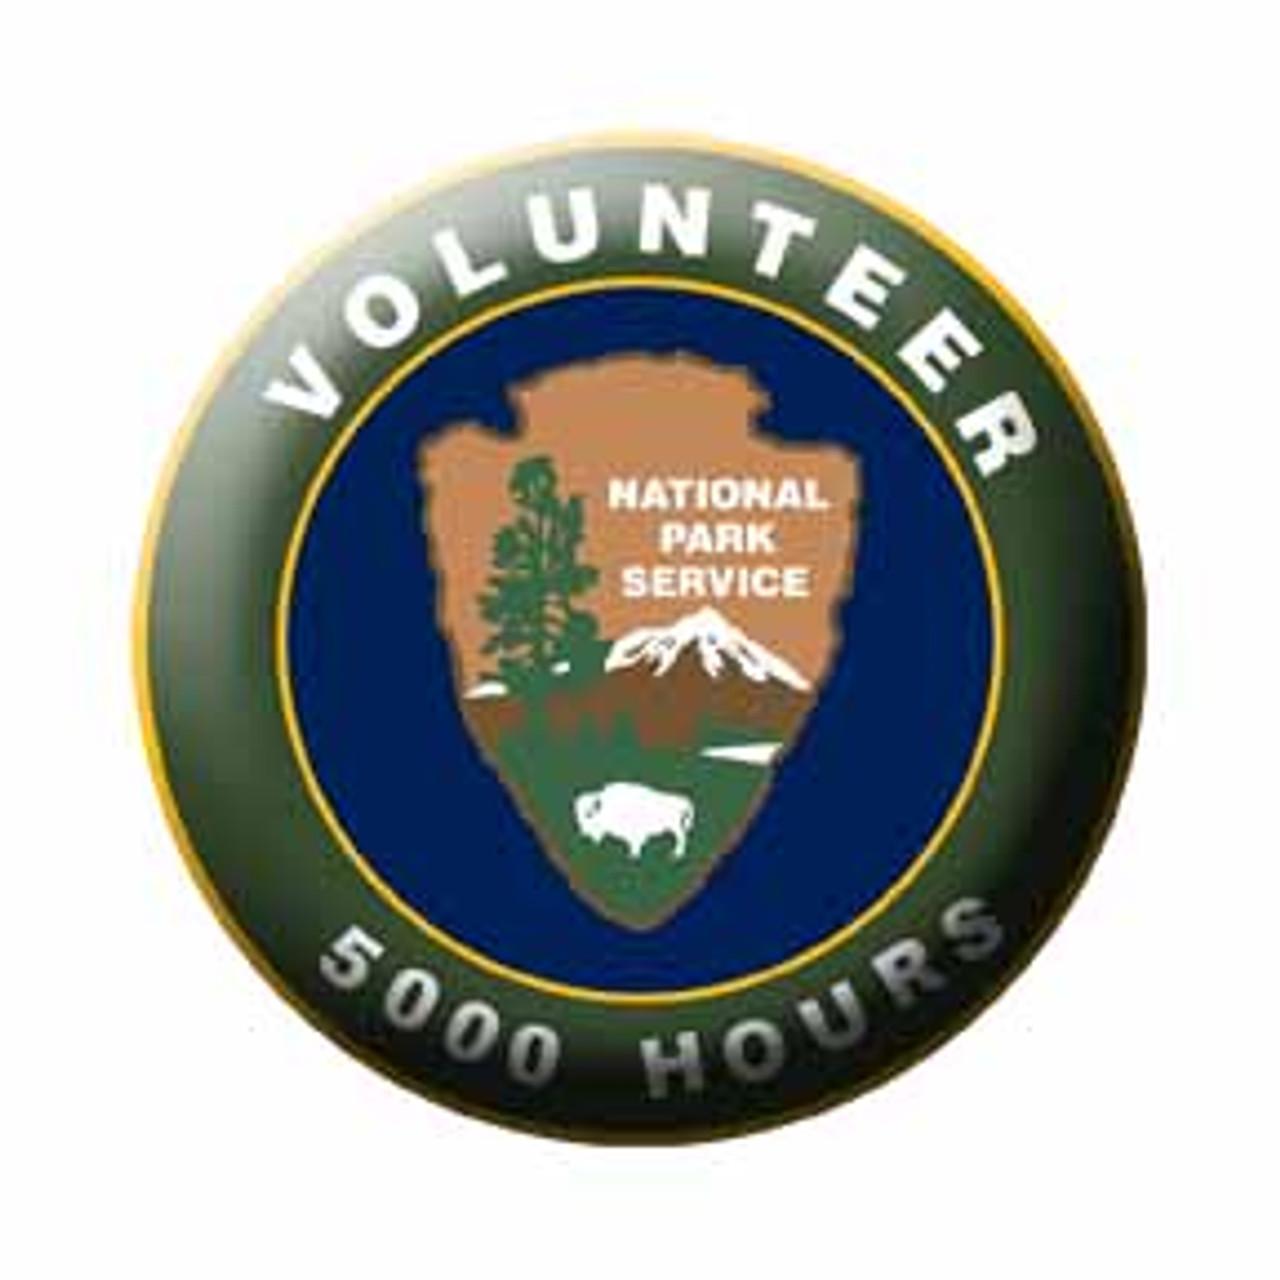 National Park Service Volunteer Hour Pins (2000 hours)